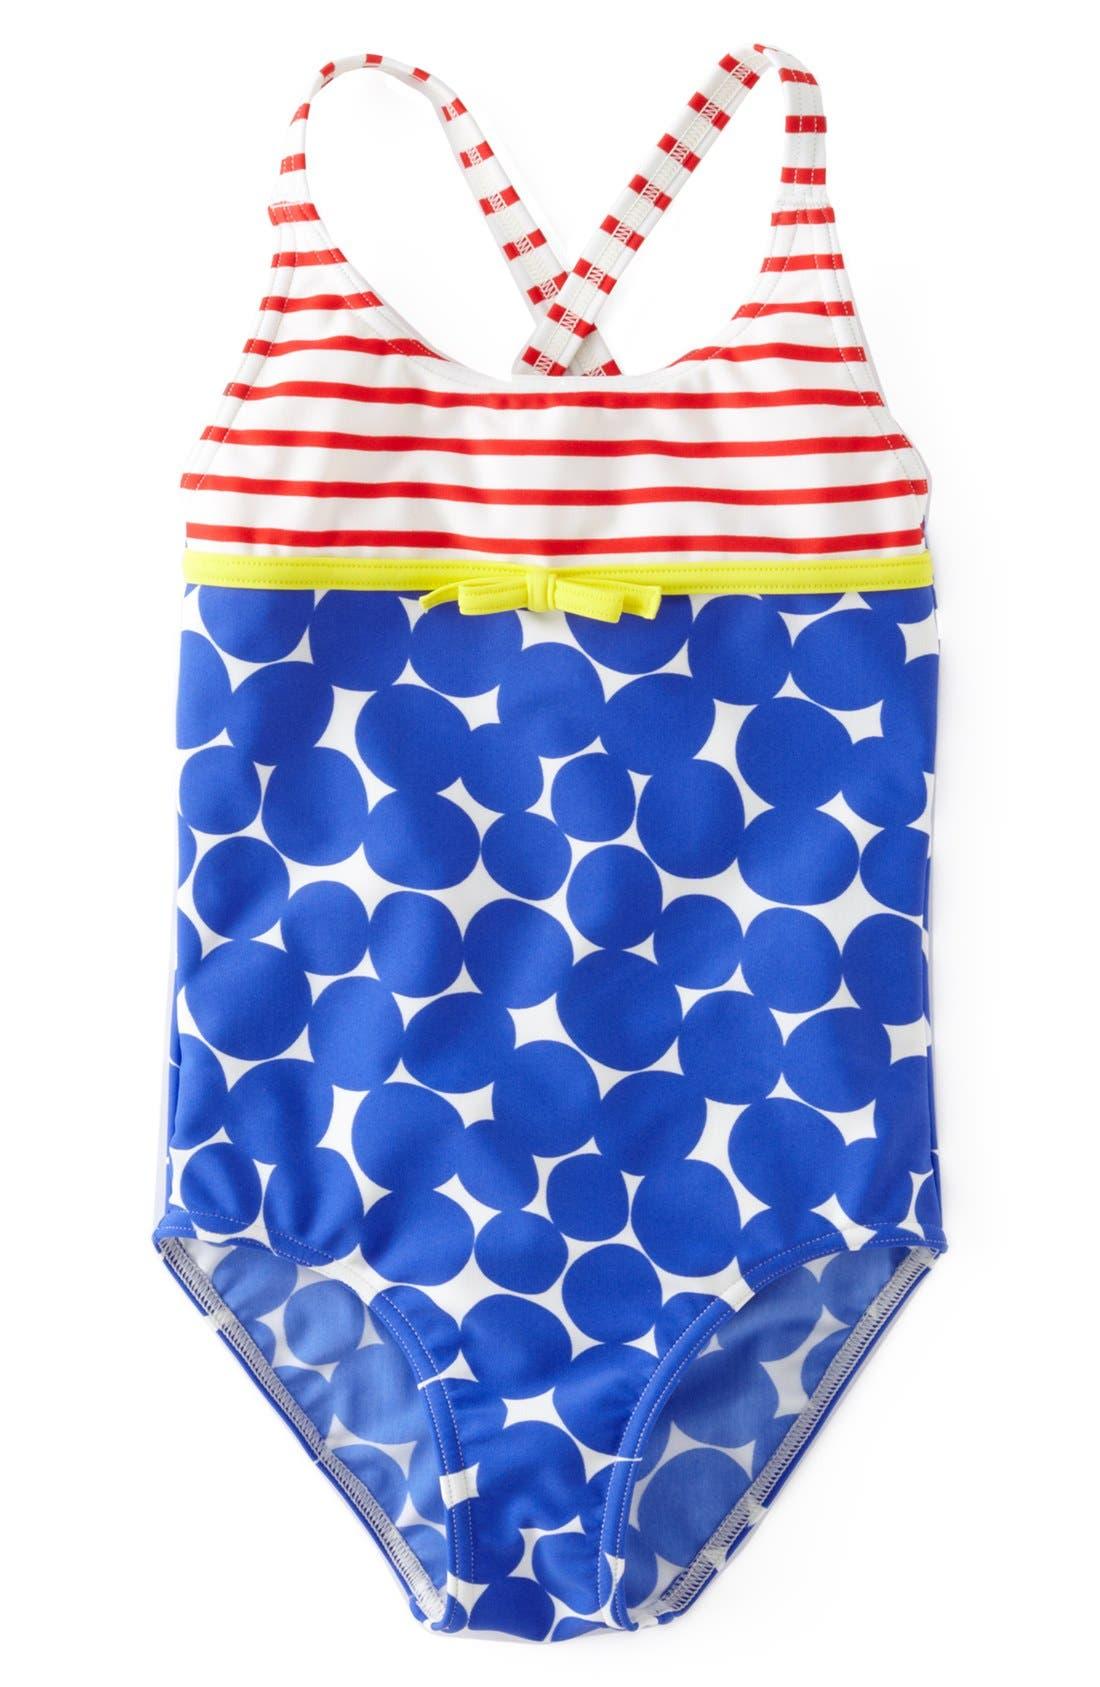 Main Image - Mini Boden 'Hopscotch' One-Piece Swimsuit (Little Girls & Big Girls)